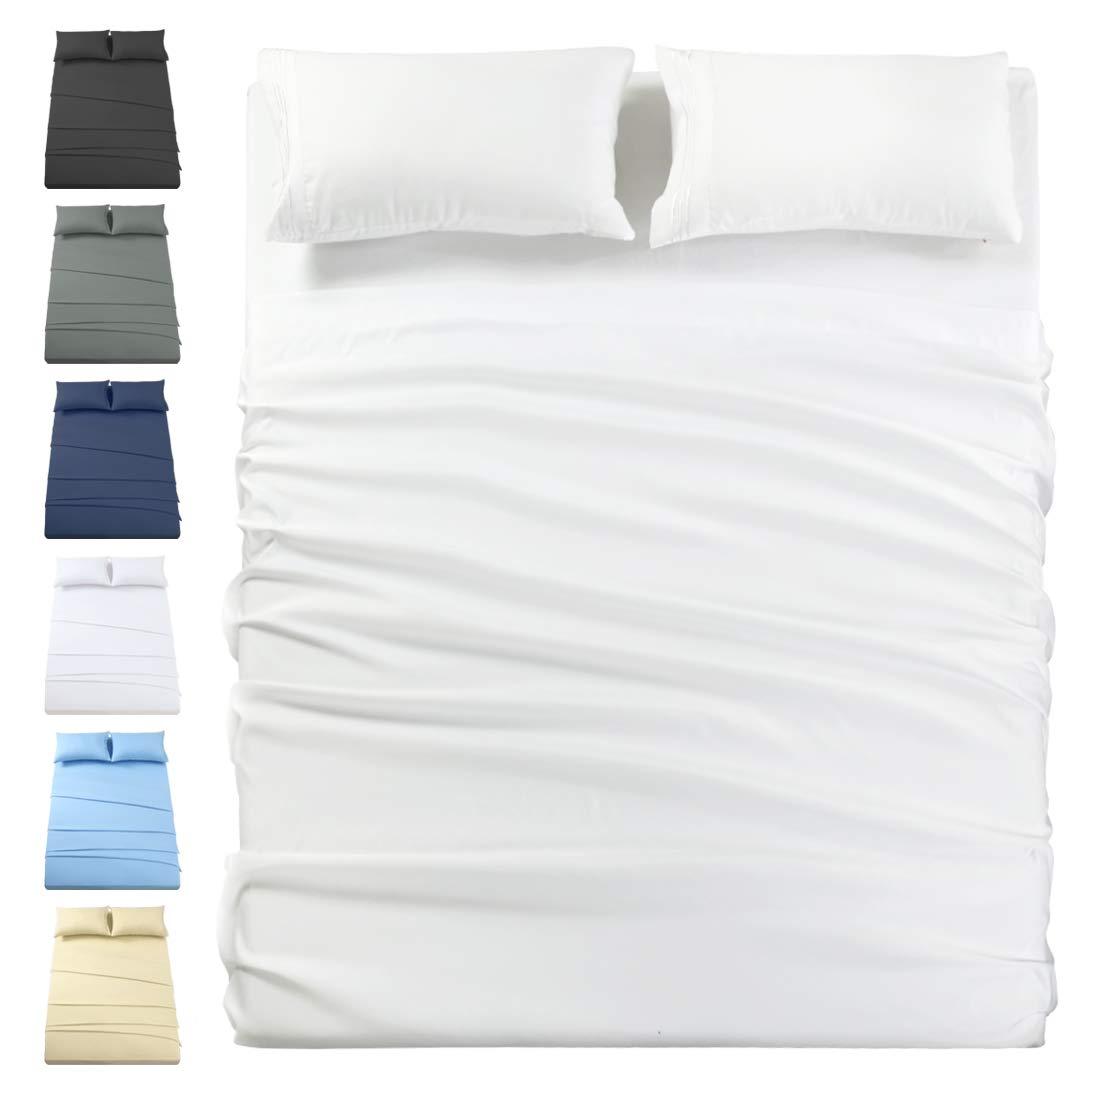 INGALIK Premium Bed Sheet Set 3 Piece 120 GSM Brushed Microfiber,1800 Series Hotel Luxury Bedding Sheets,Ultra Soft,Comfy,Fade Resistant,No Shrinkage,Hypoallergenic,Deep Pocket(White,Twin XL)